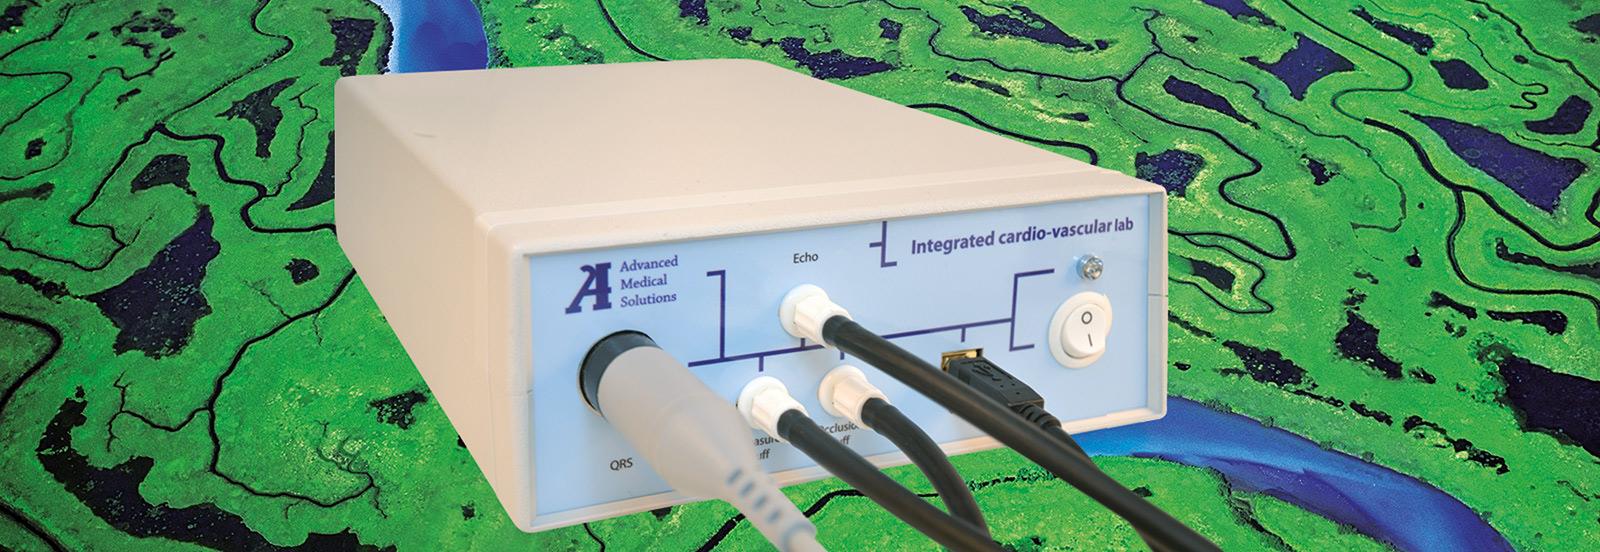 Advanced Medical Solutions Sro